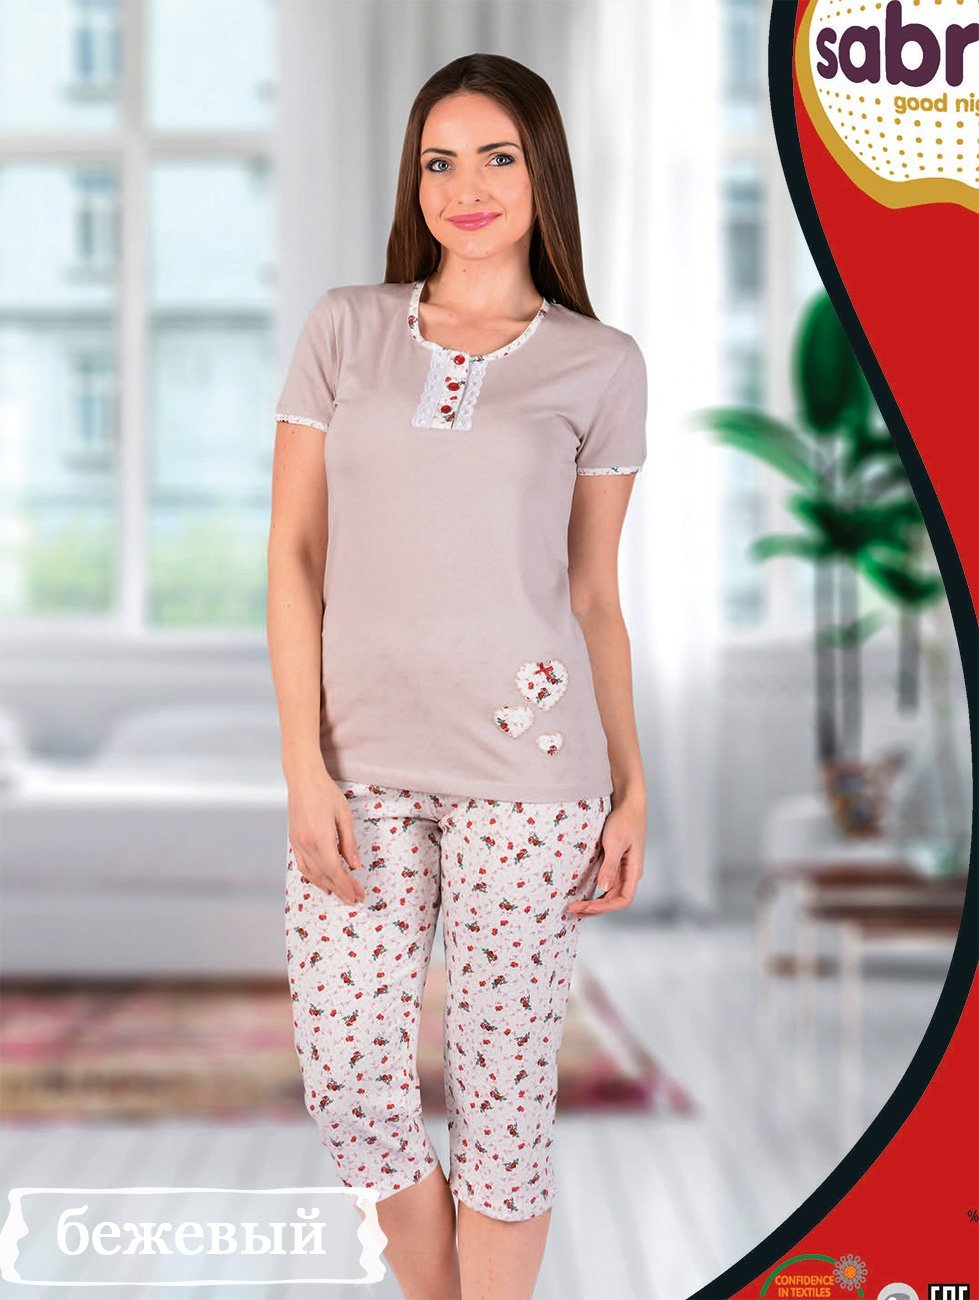 52587 Комплект (футболка+бриджи) Sabrina